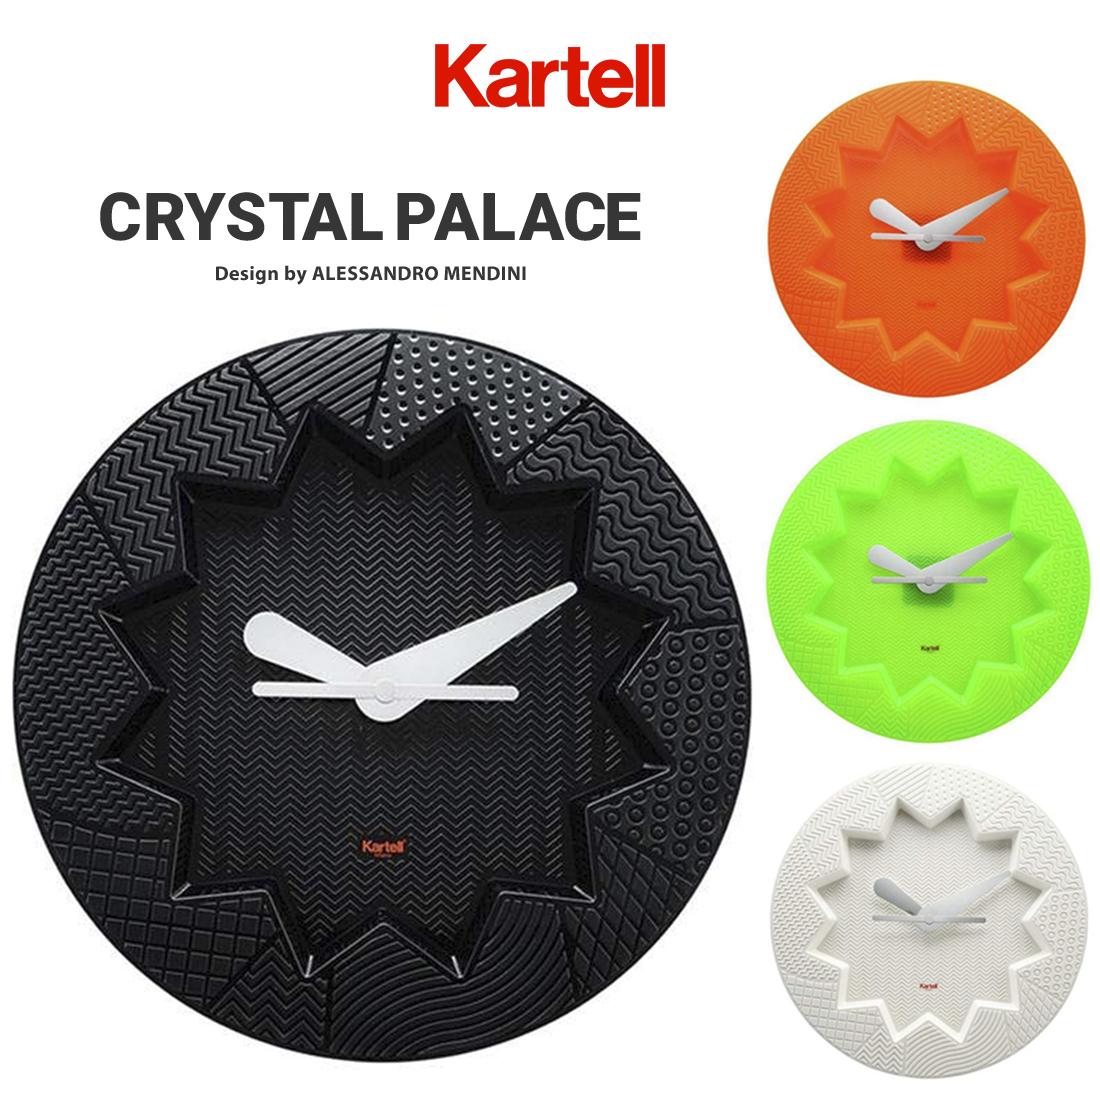 【kartell/カルテル】CRYSTAL PALACE クリスタルパレス/ウォールクロック/壁掛け時計/George Nelson/掛け時計/クロック